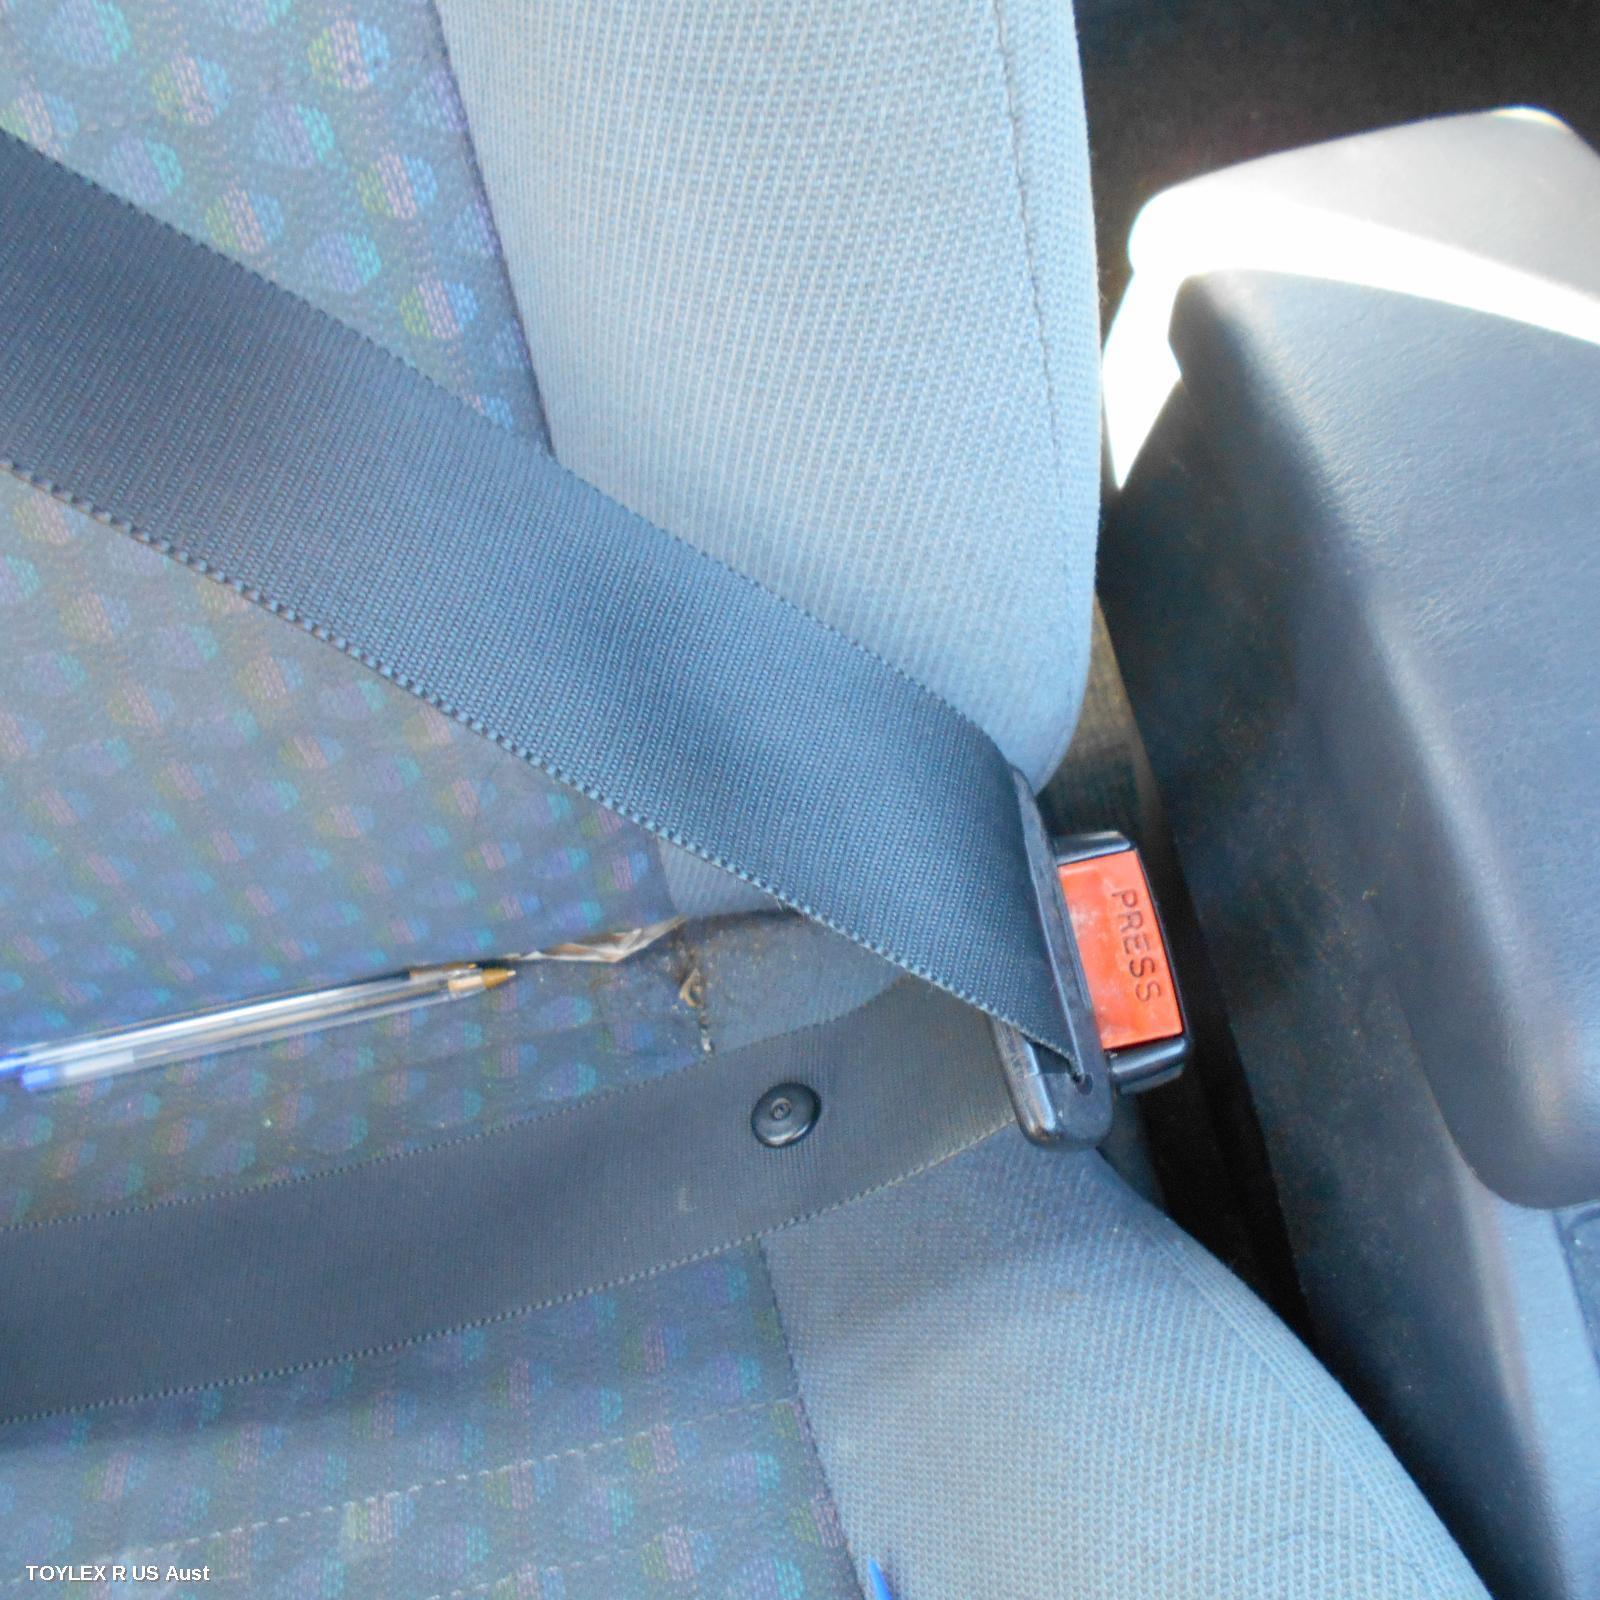 TOYOTA COROLLA, Seatbelt/Stalk, RH FRONT, SEAT BELT STALK ONLY, HATCH, AE101, 05/92-10/99